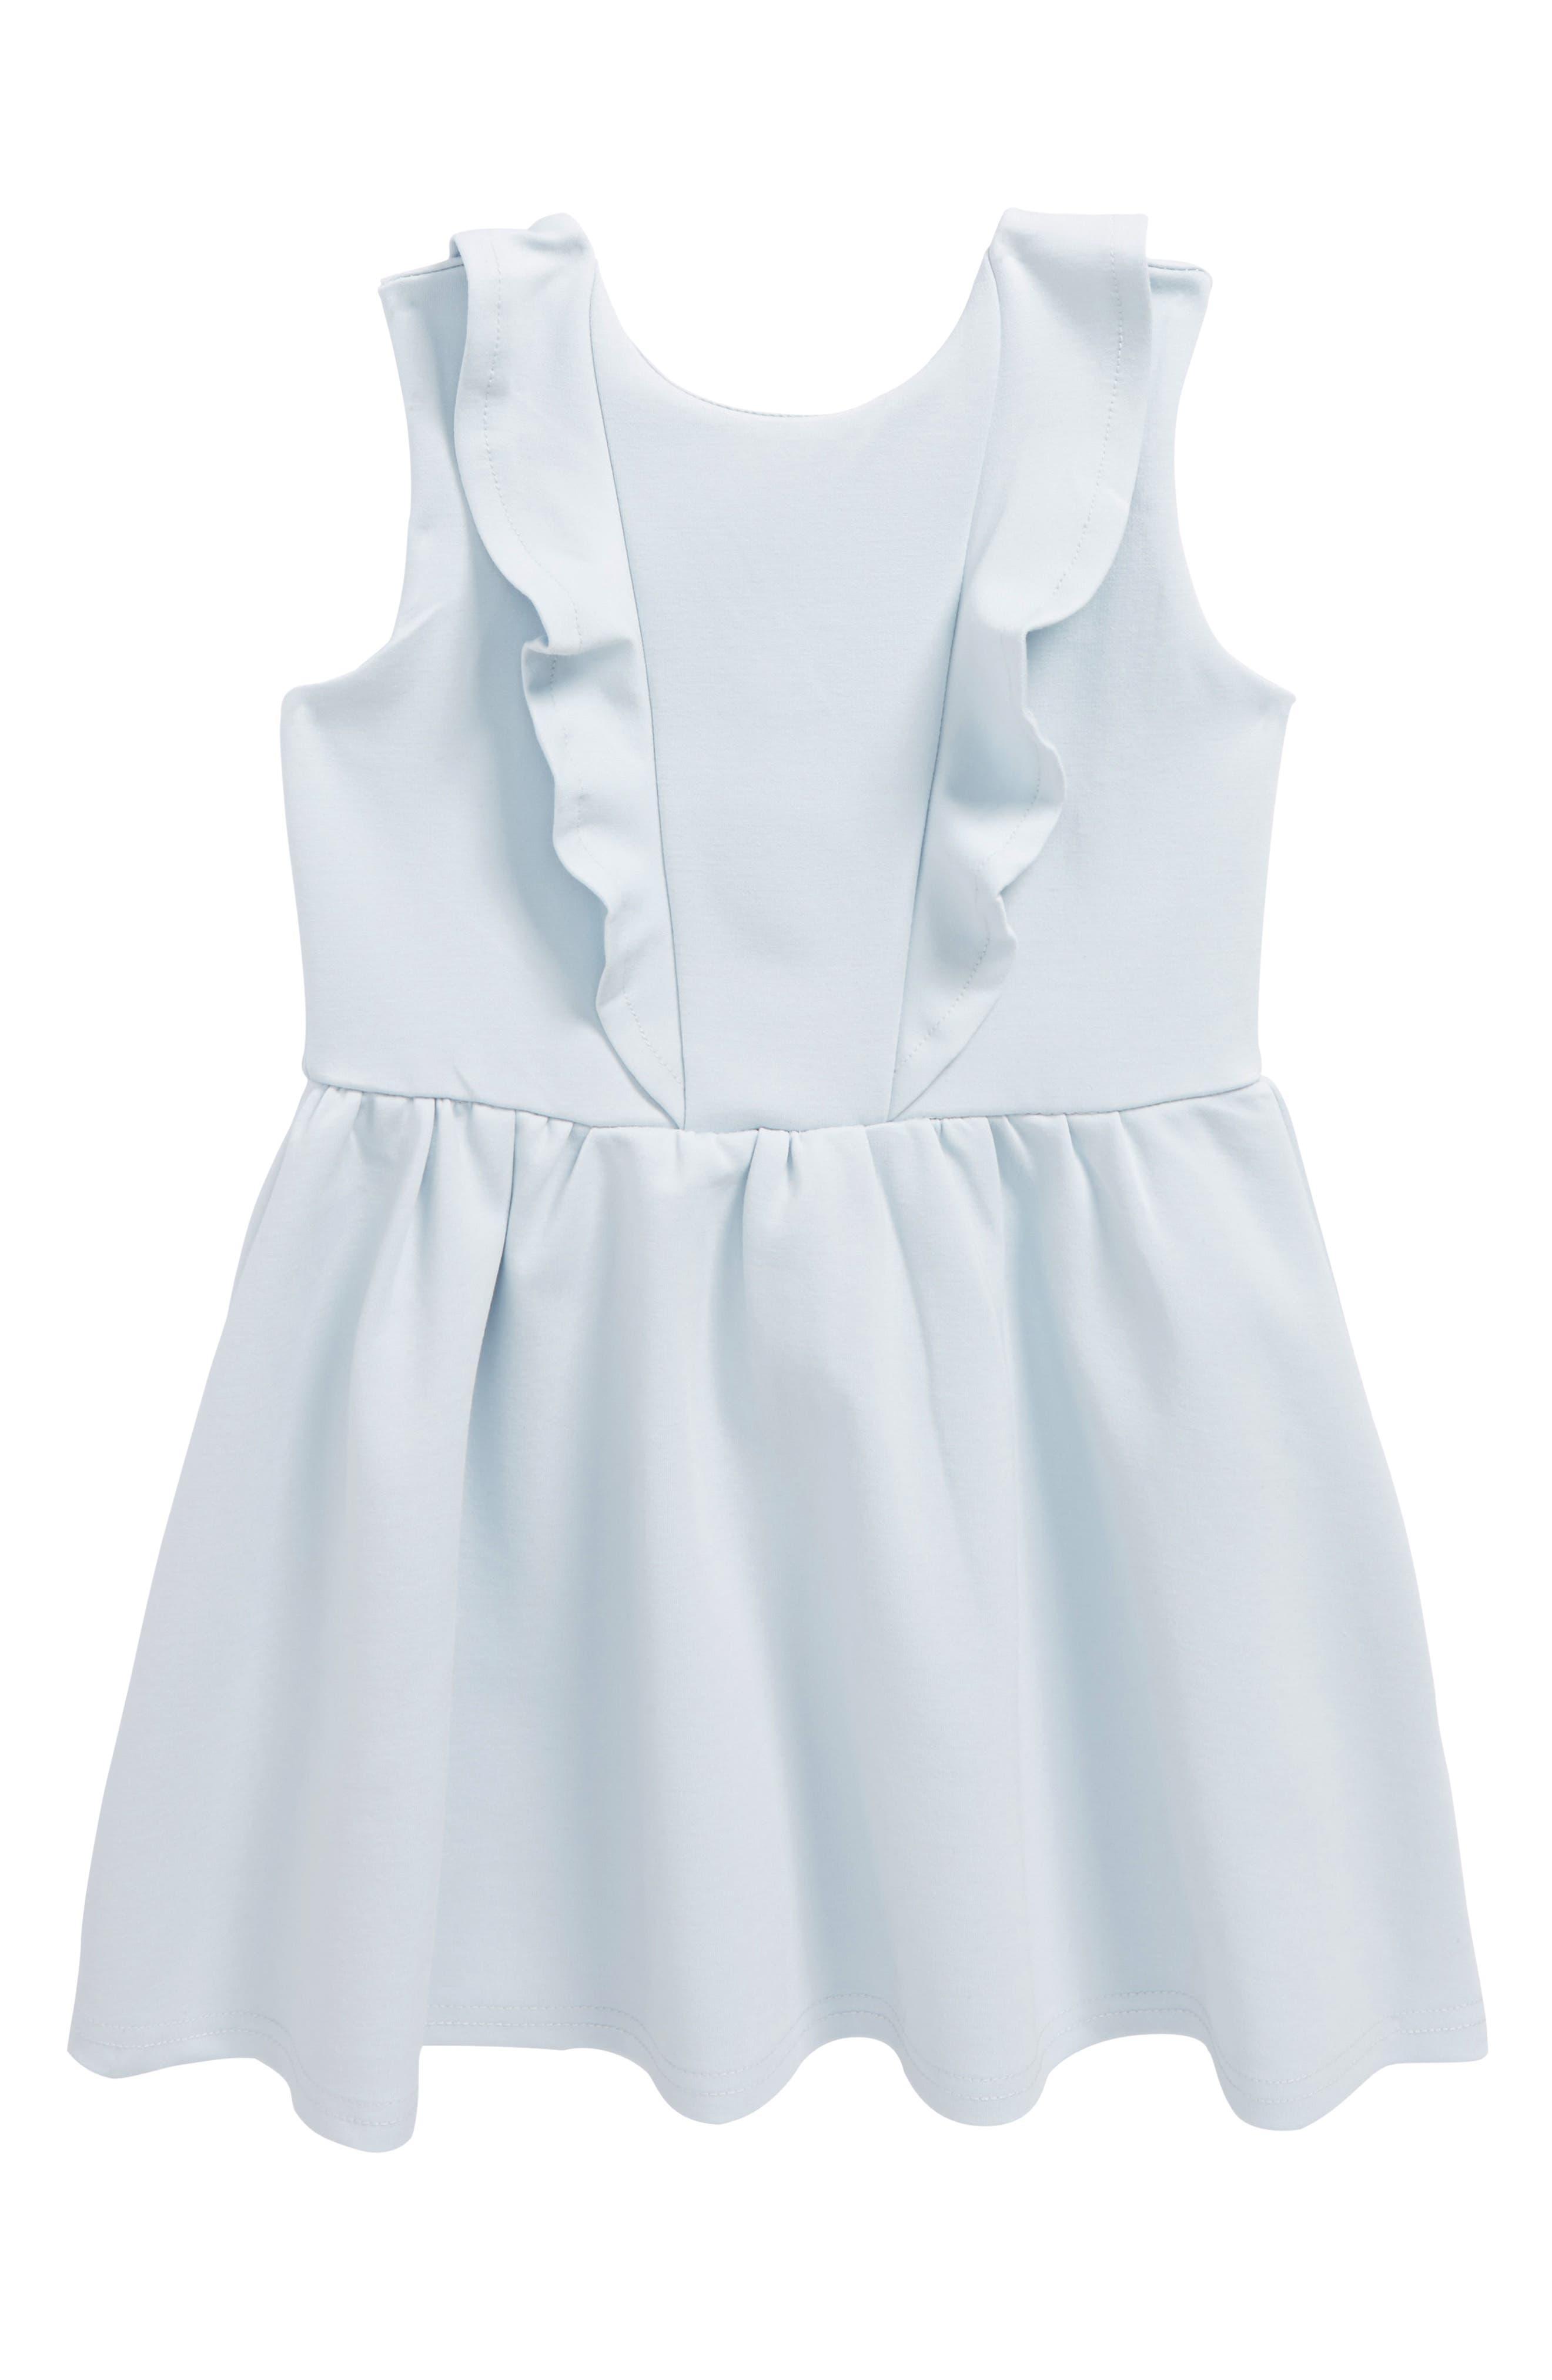 Main Image - Bardot Junior Sheylah Sleeveless Dress (Toddler Girls & Little Girls)